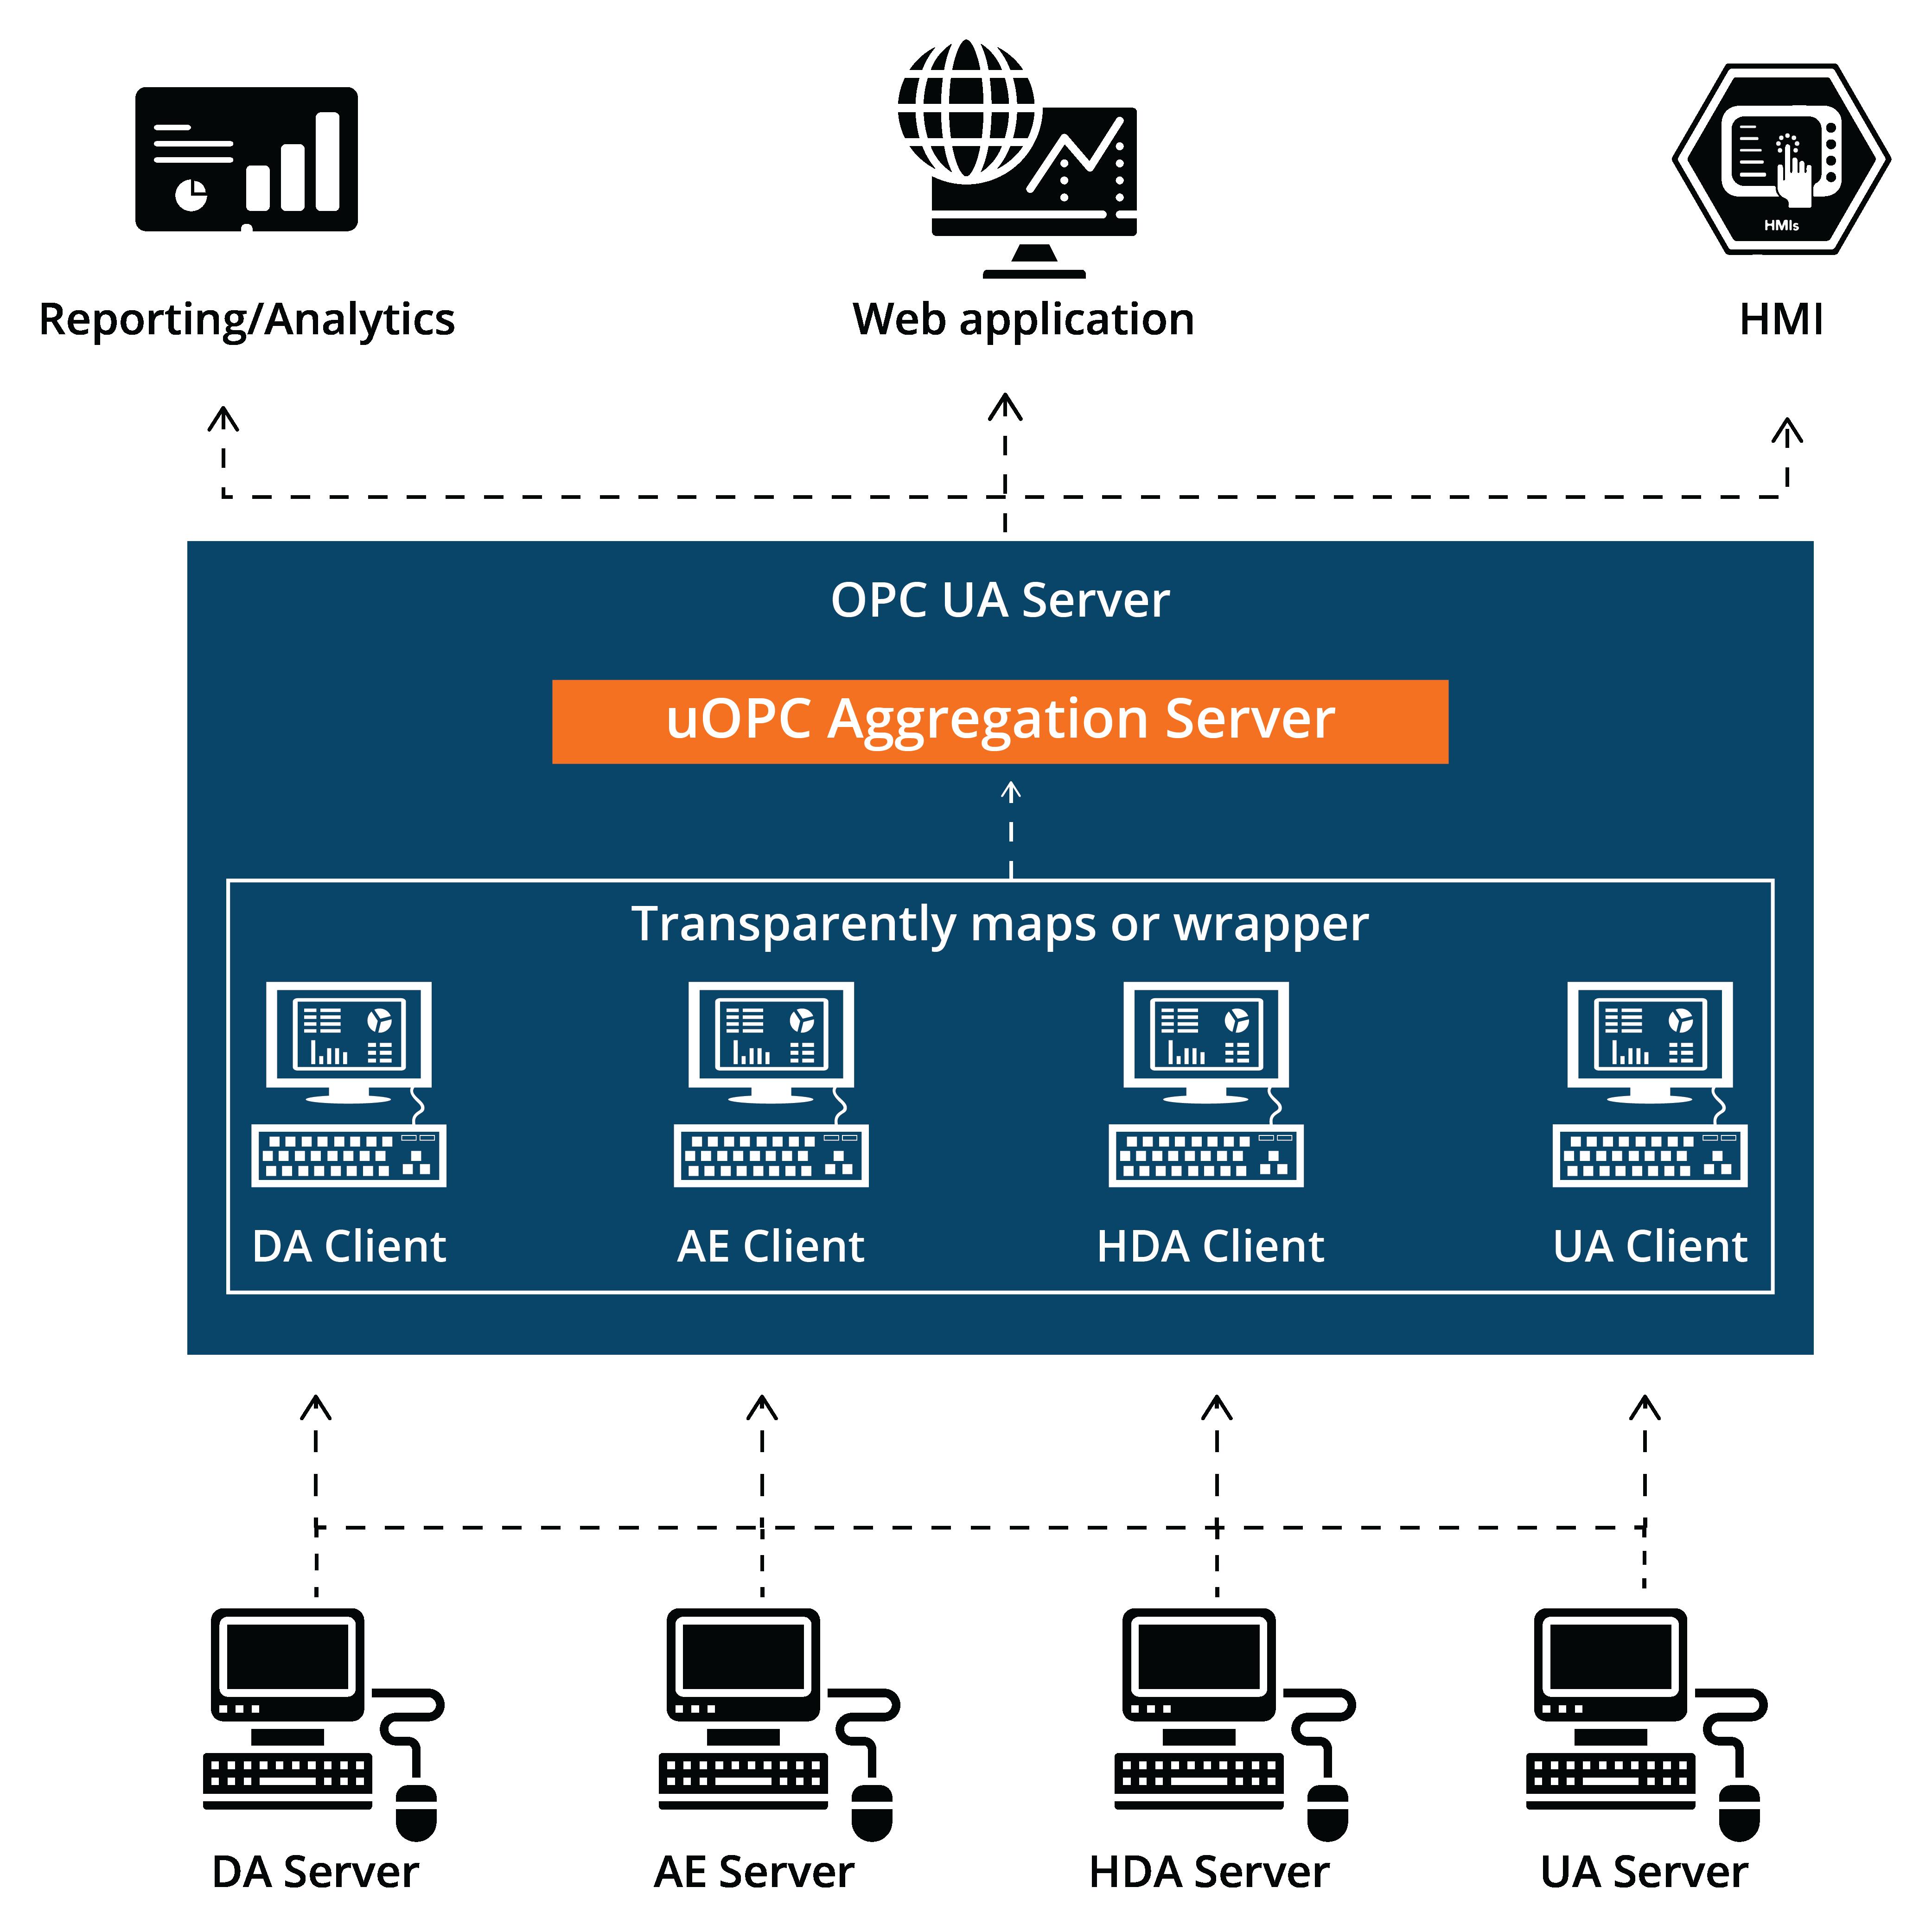 uOPC Aggregation Server